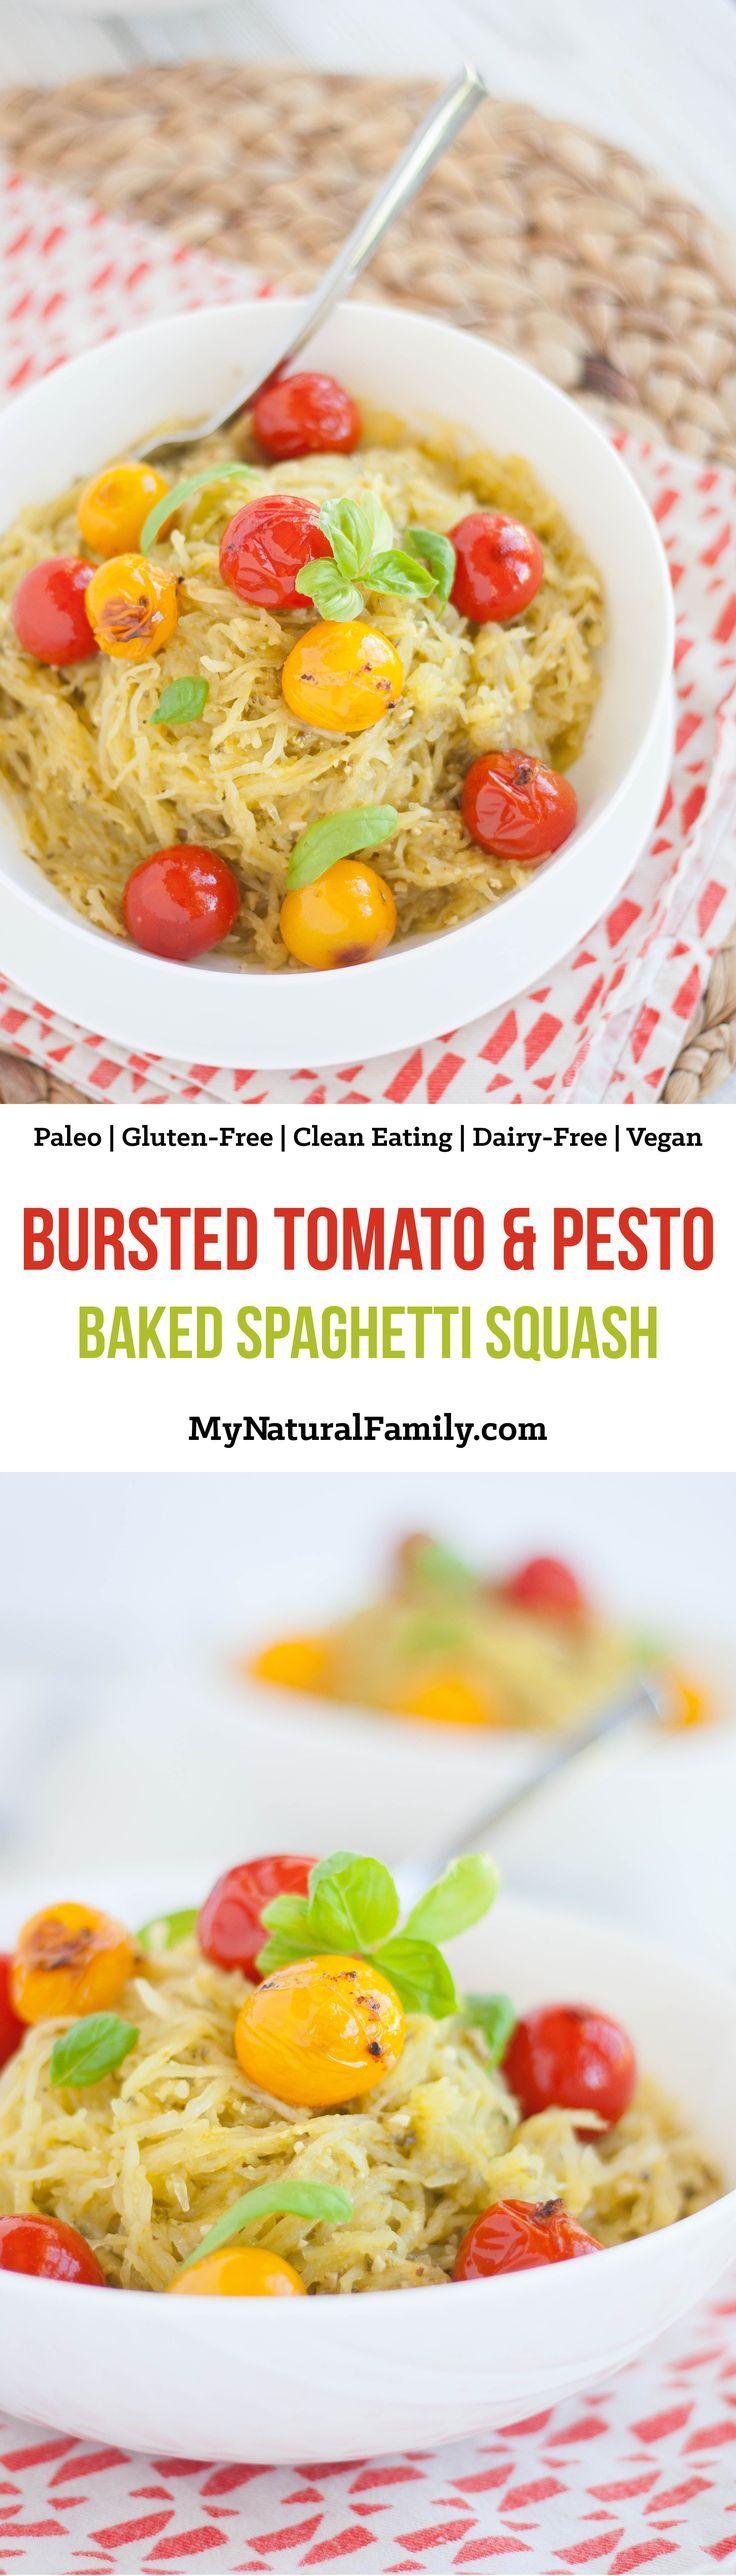 Bursted Tomato & Pesto Baked Spaghetti Squash Recipe {Paleo, Gluten-Free, Clean Eating, Dairy-Free, Vegan}